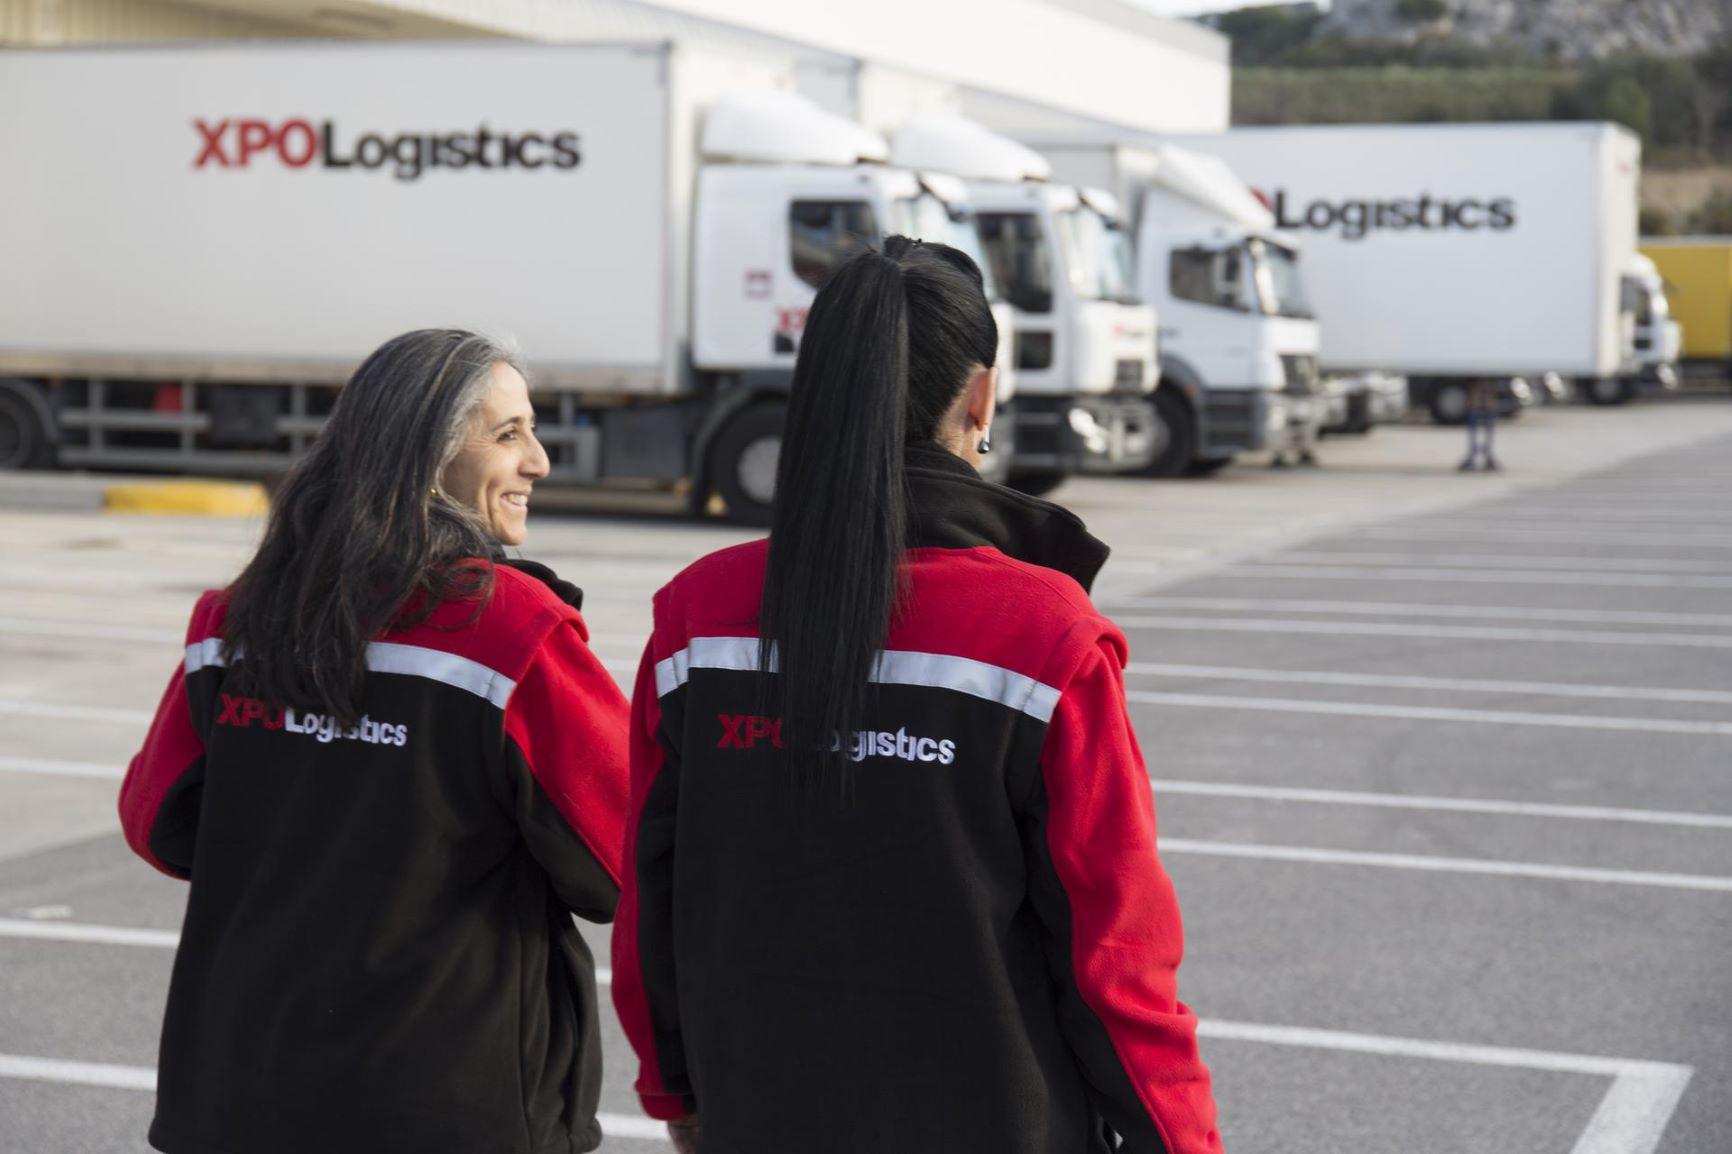 XPO Logistics completes acquisition of Kuehne+Nagel's UK contract logistics portfolio